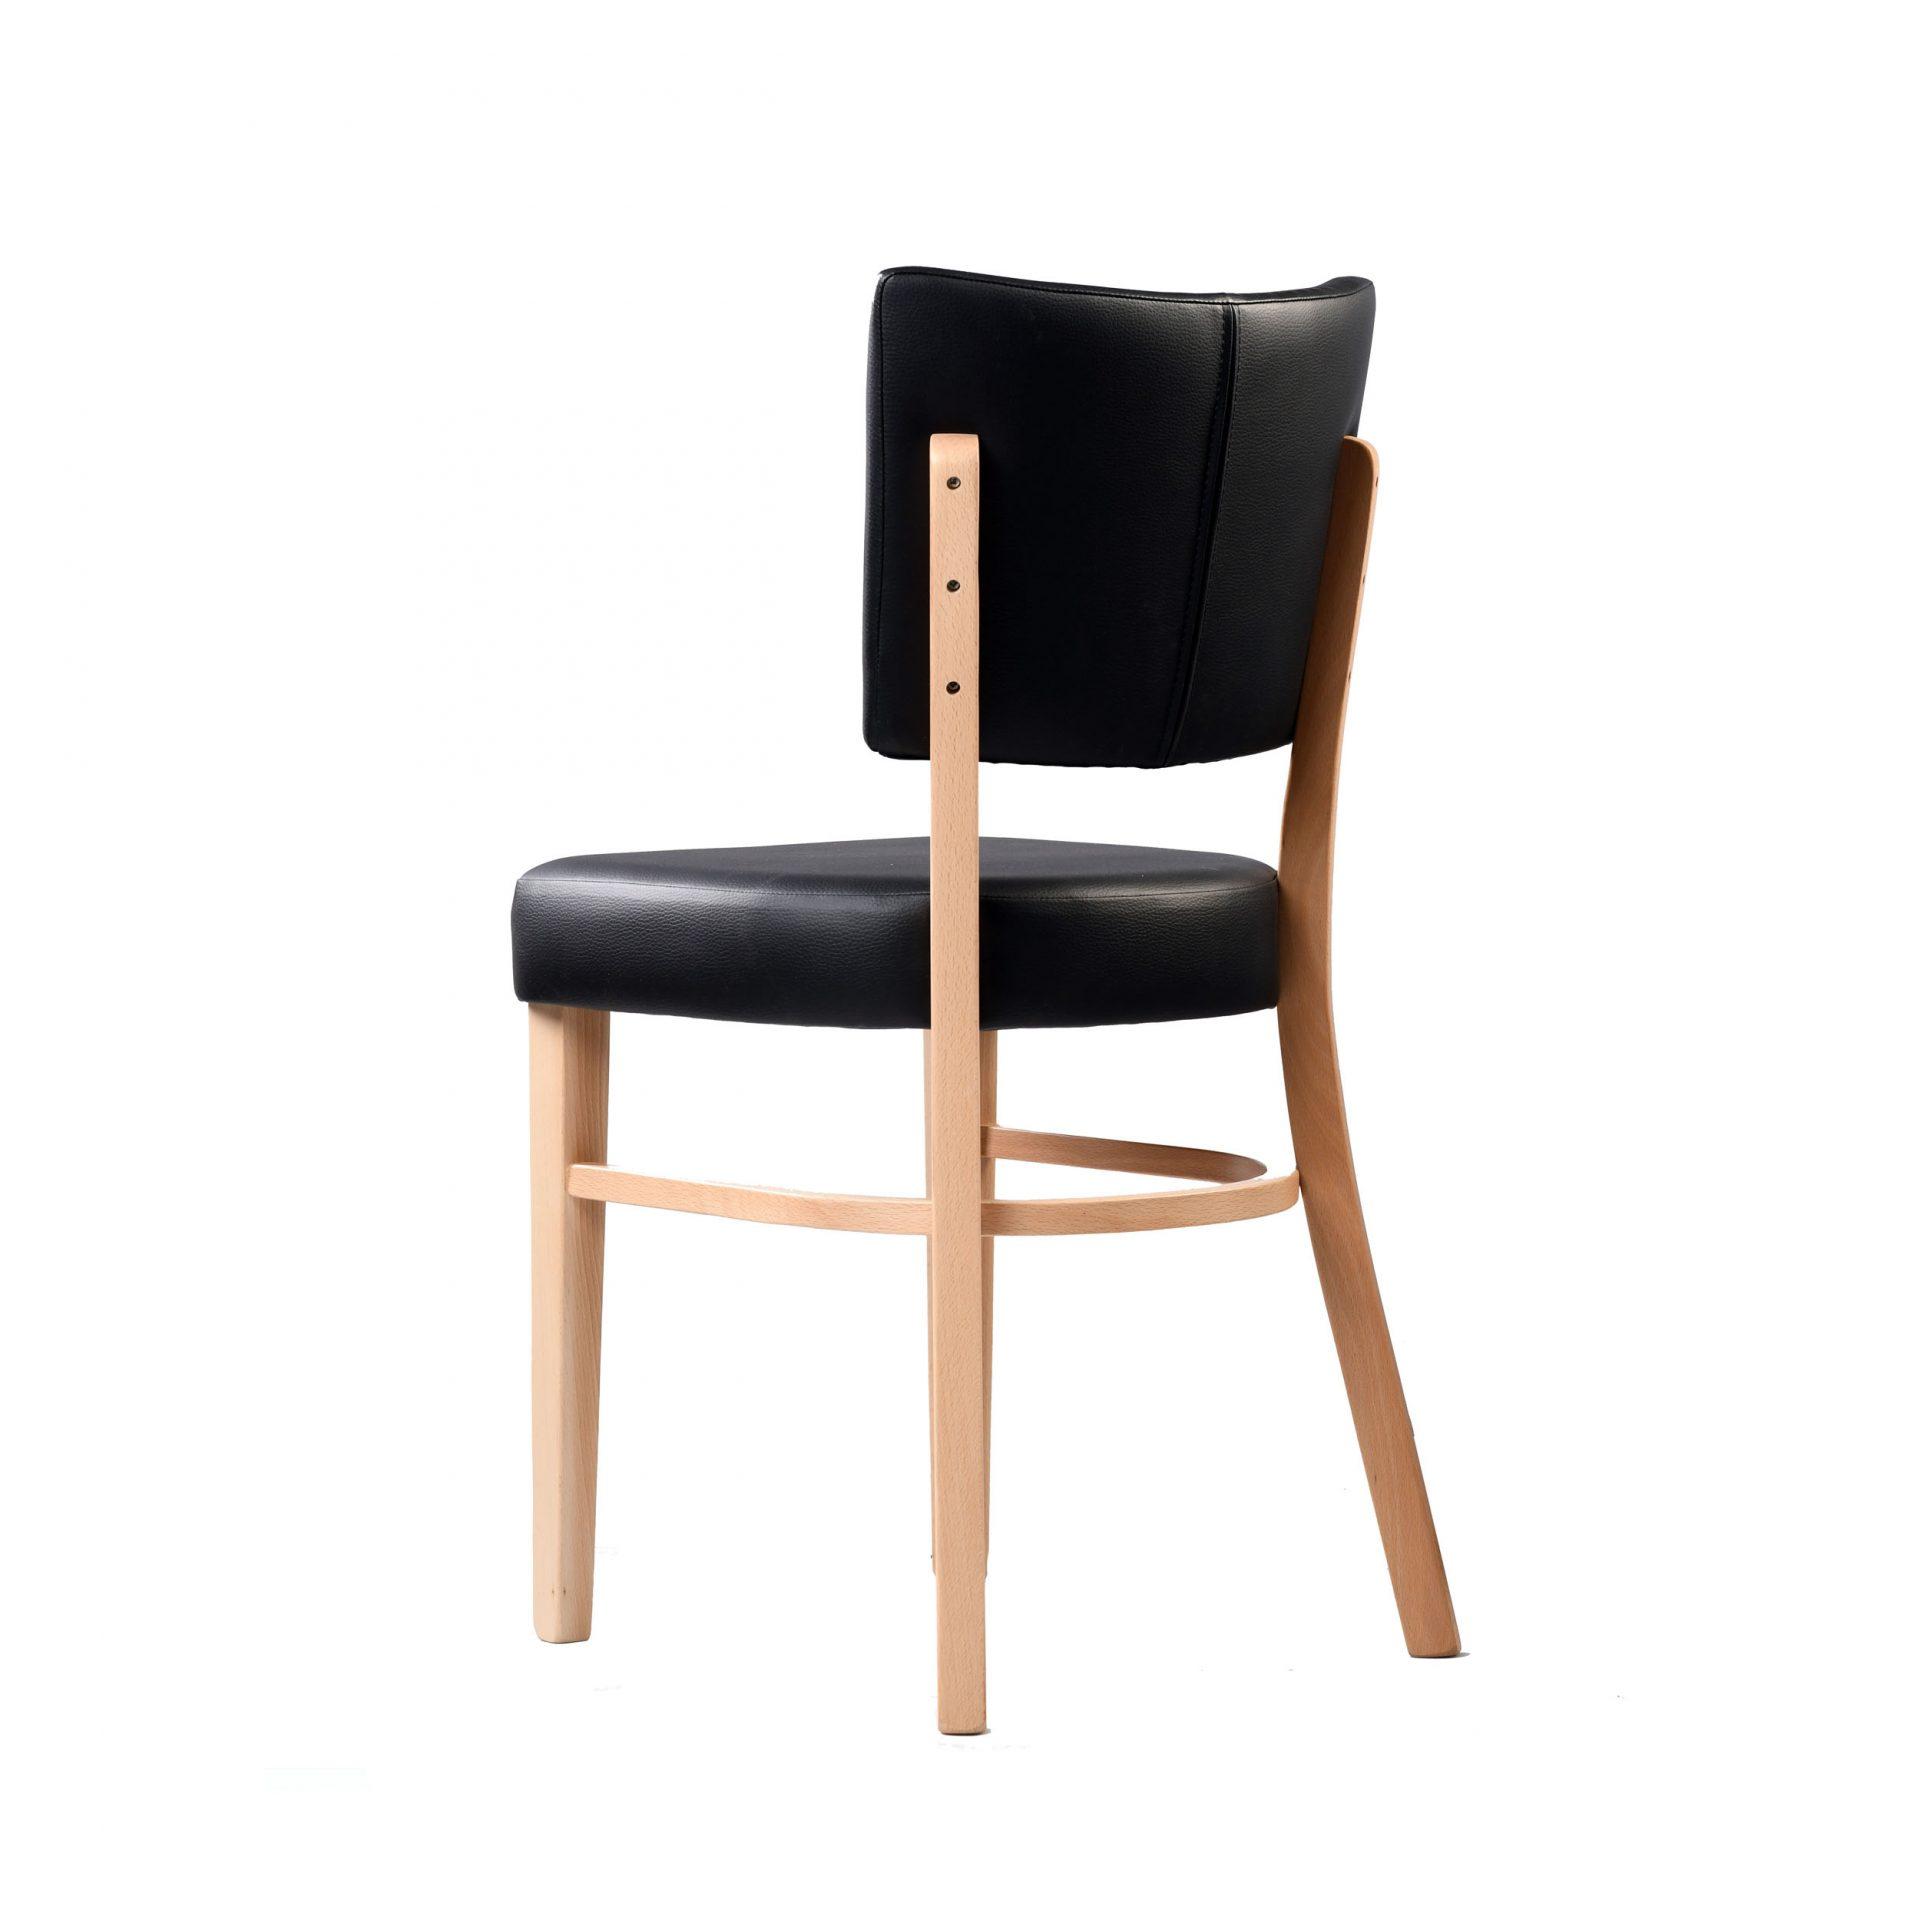 memphis chair black vinyl seat and backrest natural frame back left